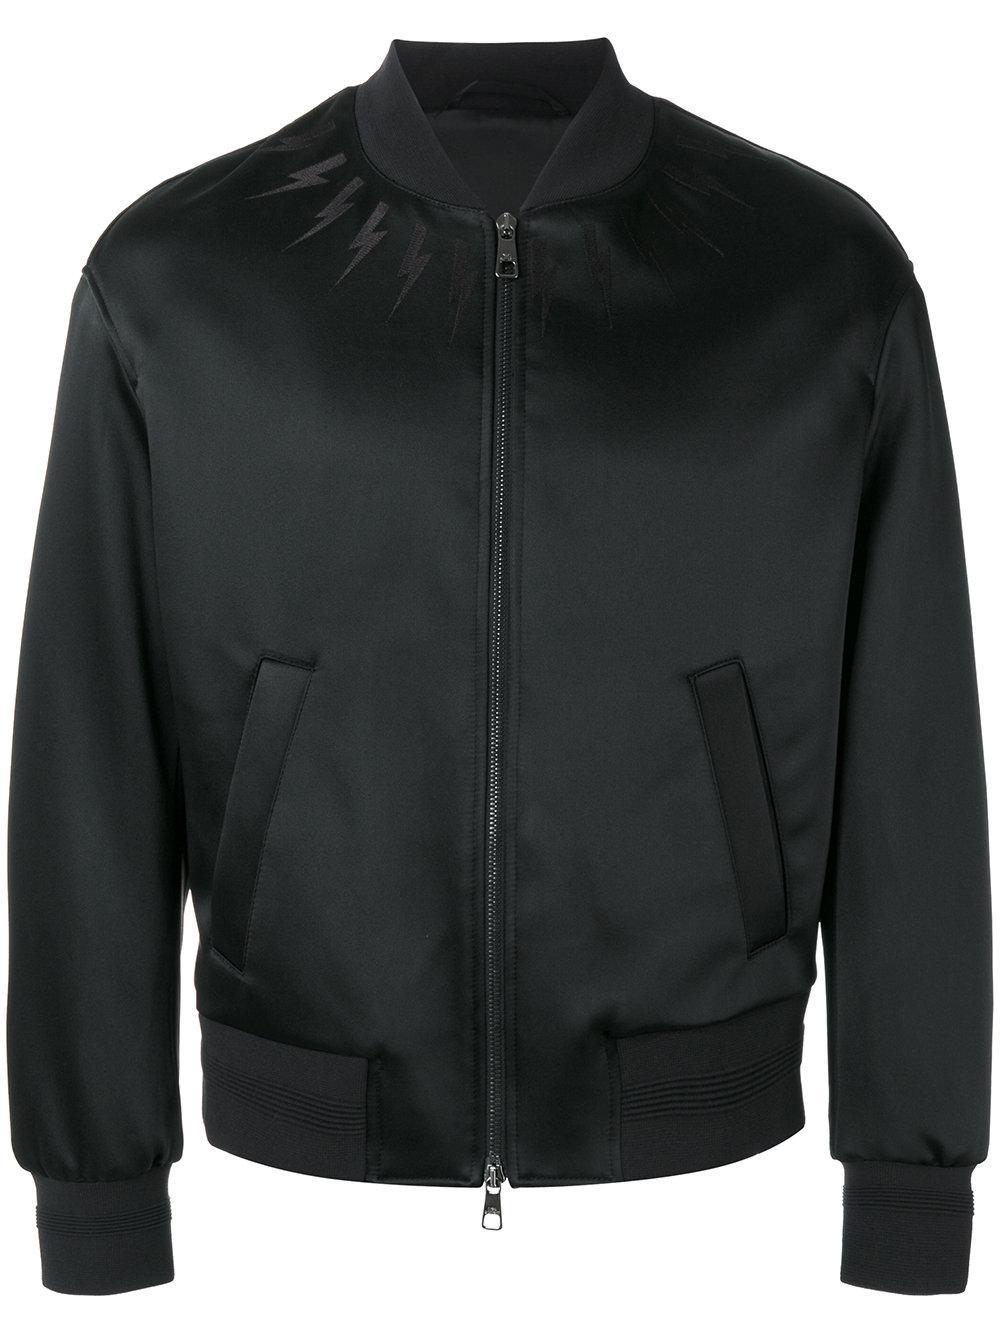 Lighting Jacket: Neil Barrett Lightning Bolt Bomber Jacket In Black